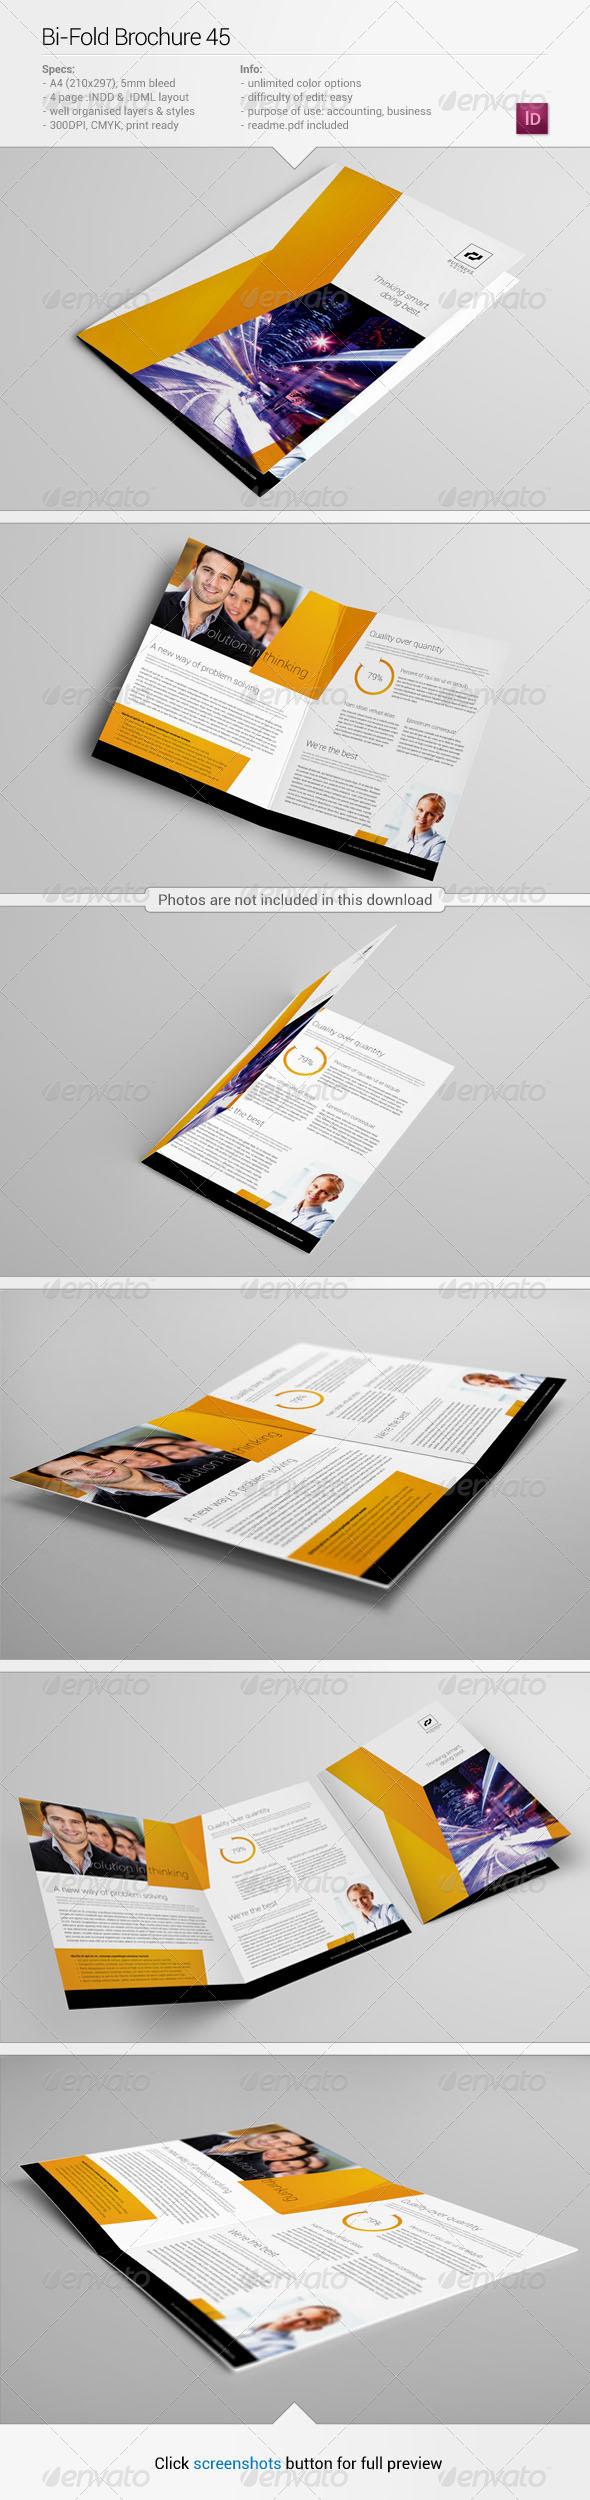 Bi-Fold Brochure 45 - Corporate Brochures